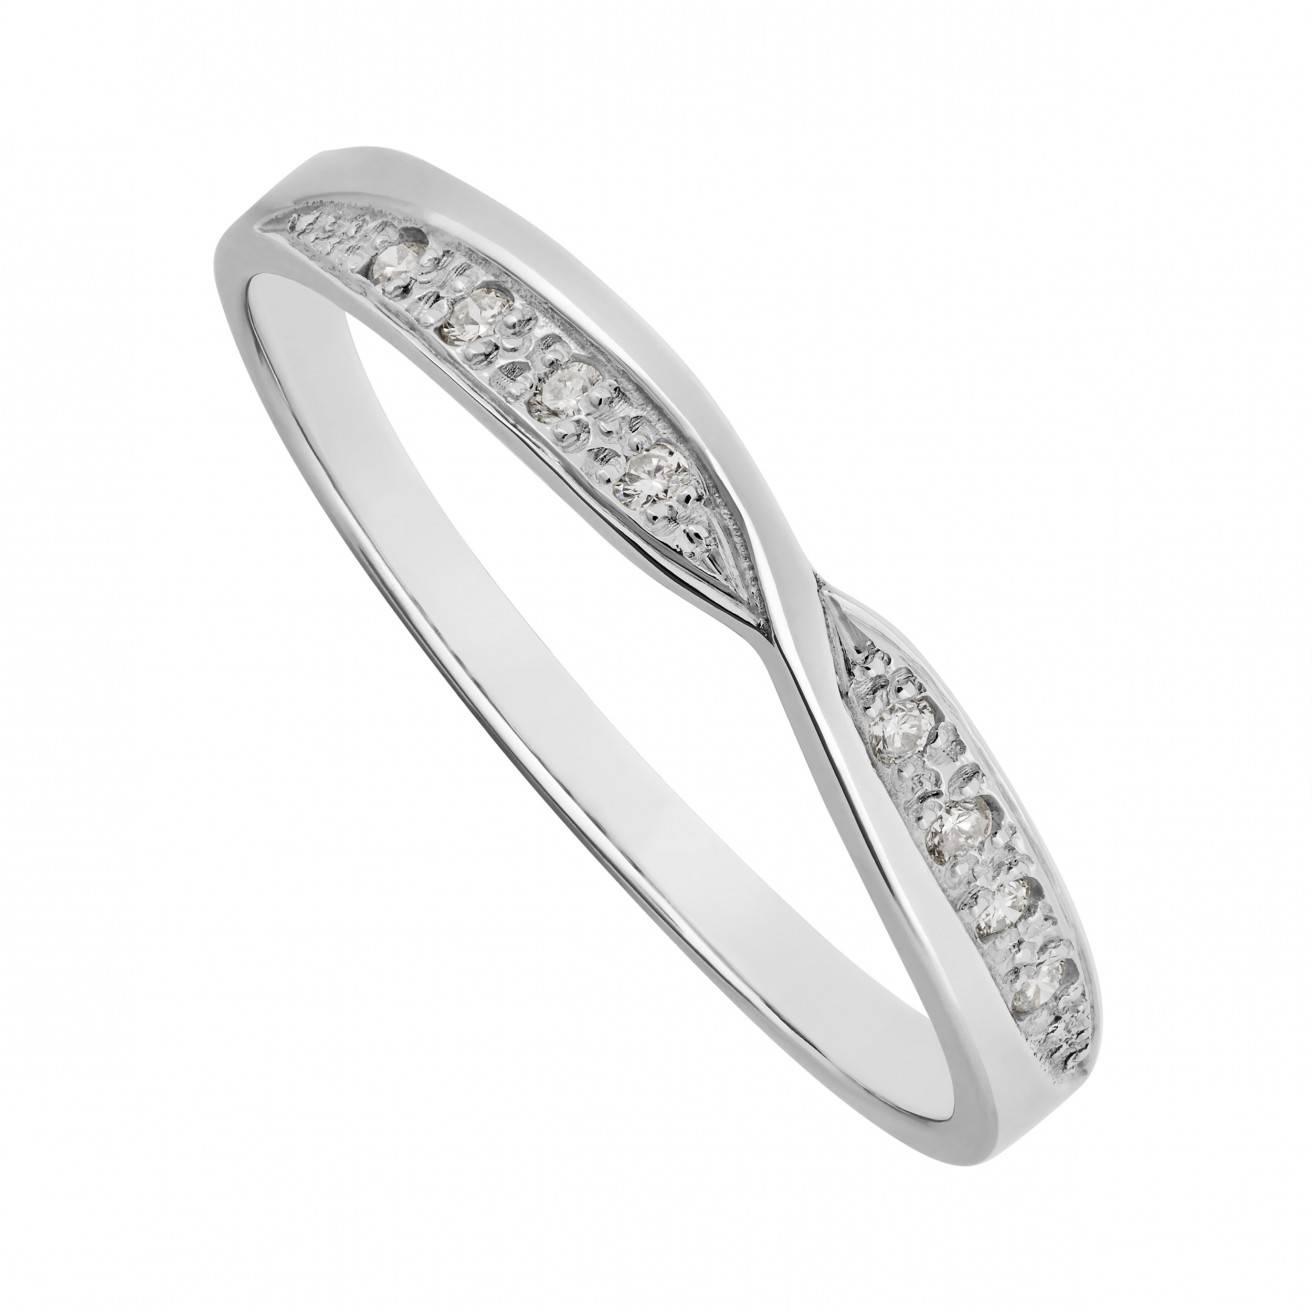 Buy A Diamond Wedding Ring Online – Fraser Hart With Regard To Diamond Wedding Rings (View 7 of 15)